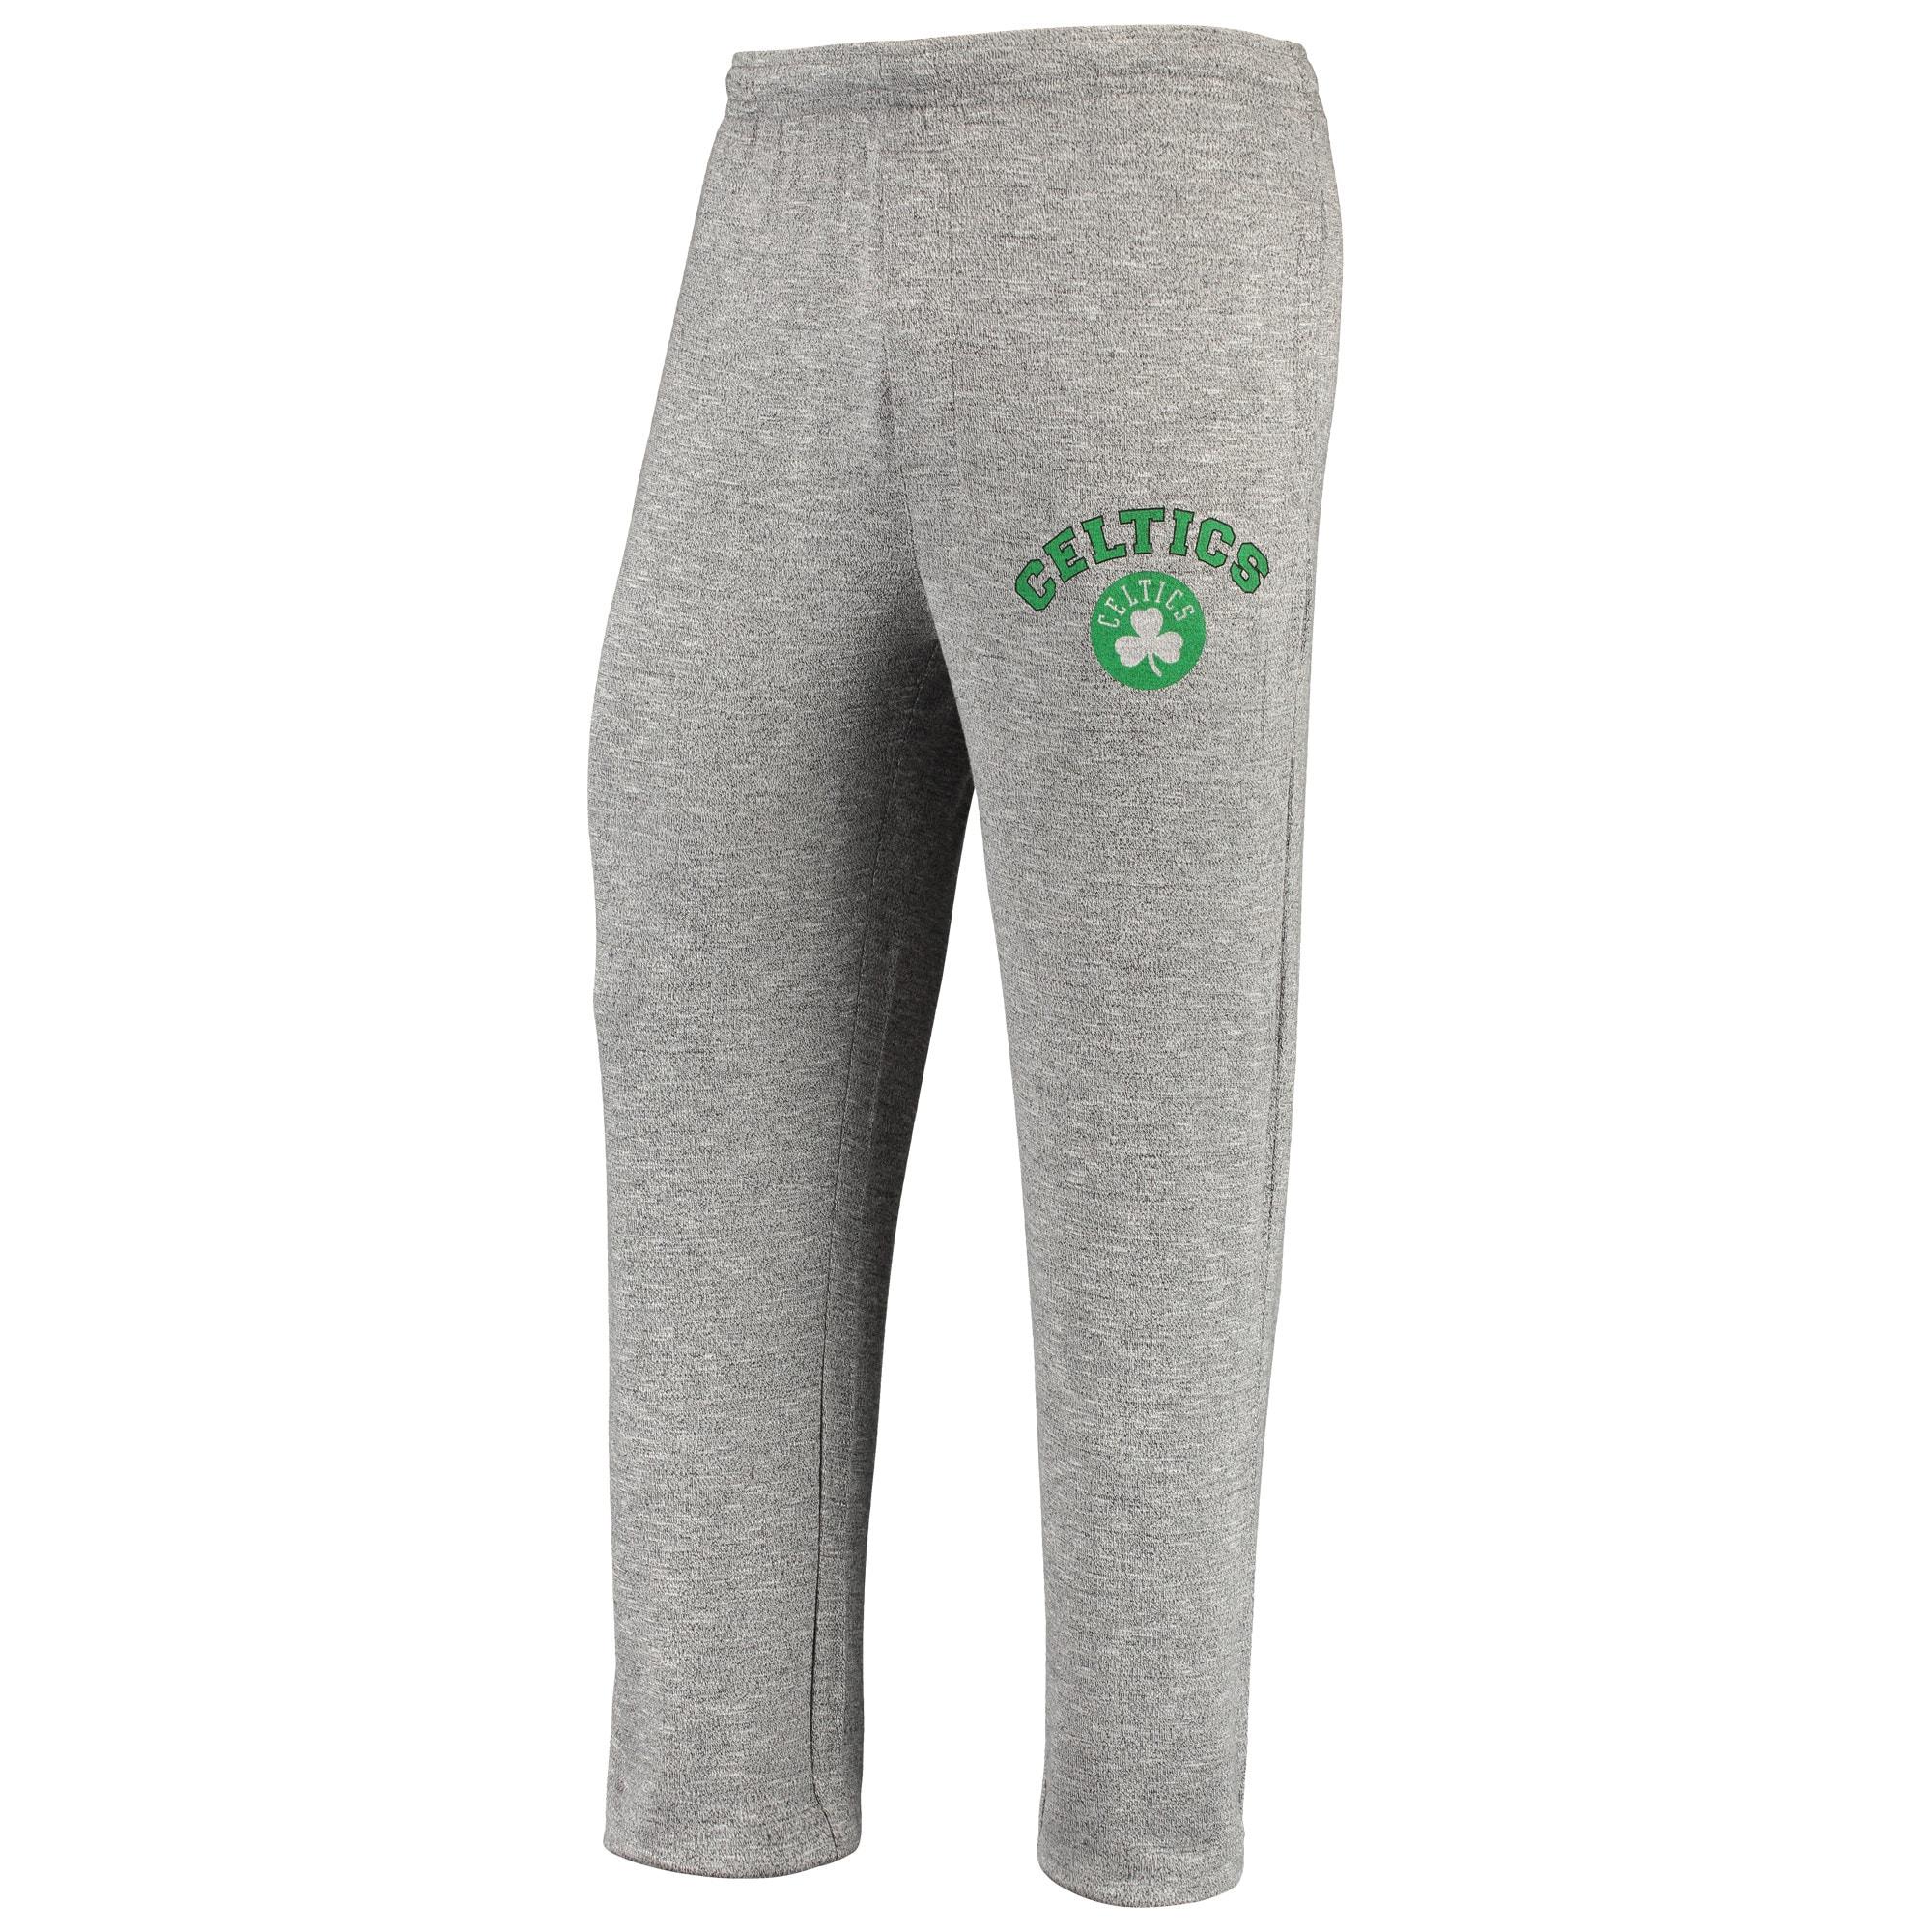 Boston Celtics Concepts Sport Tri-Blend Layover Knit Pants - Heathered Gray